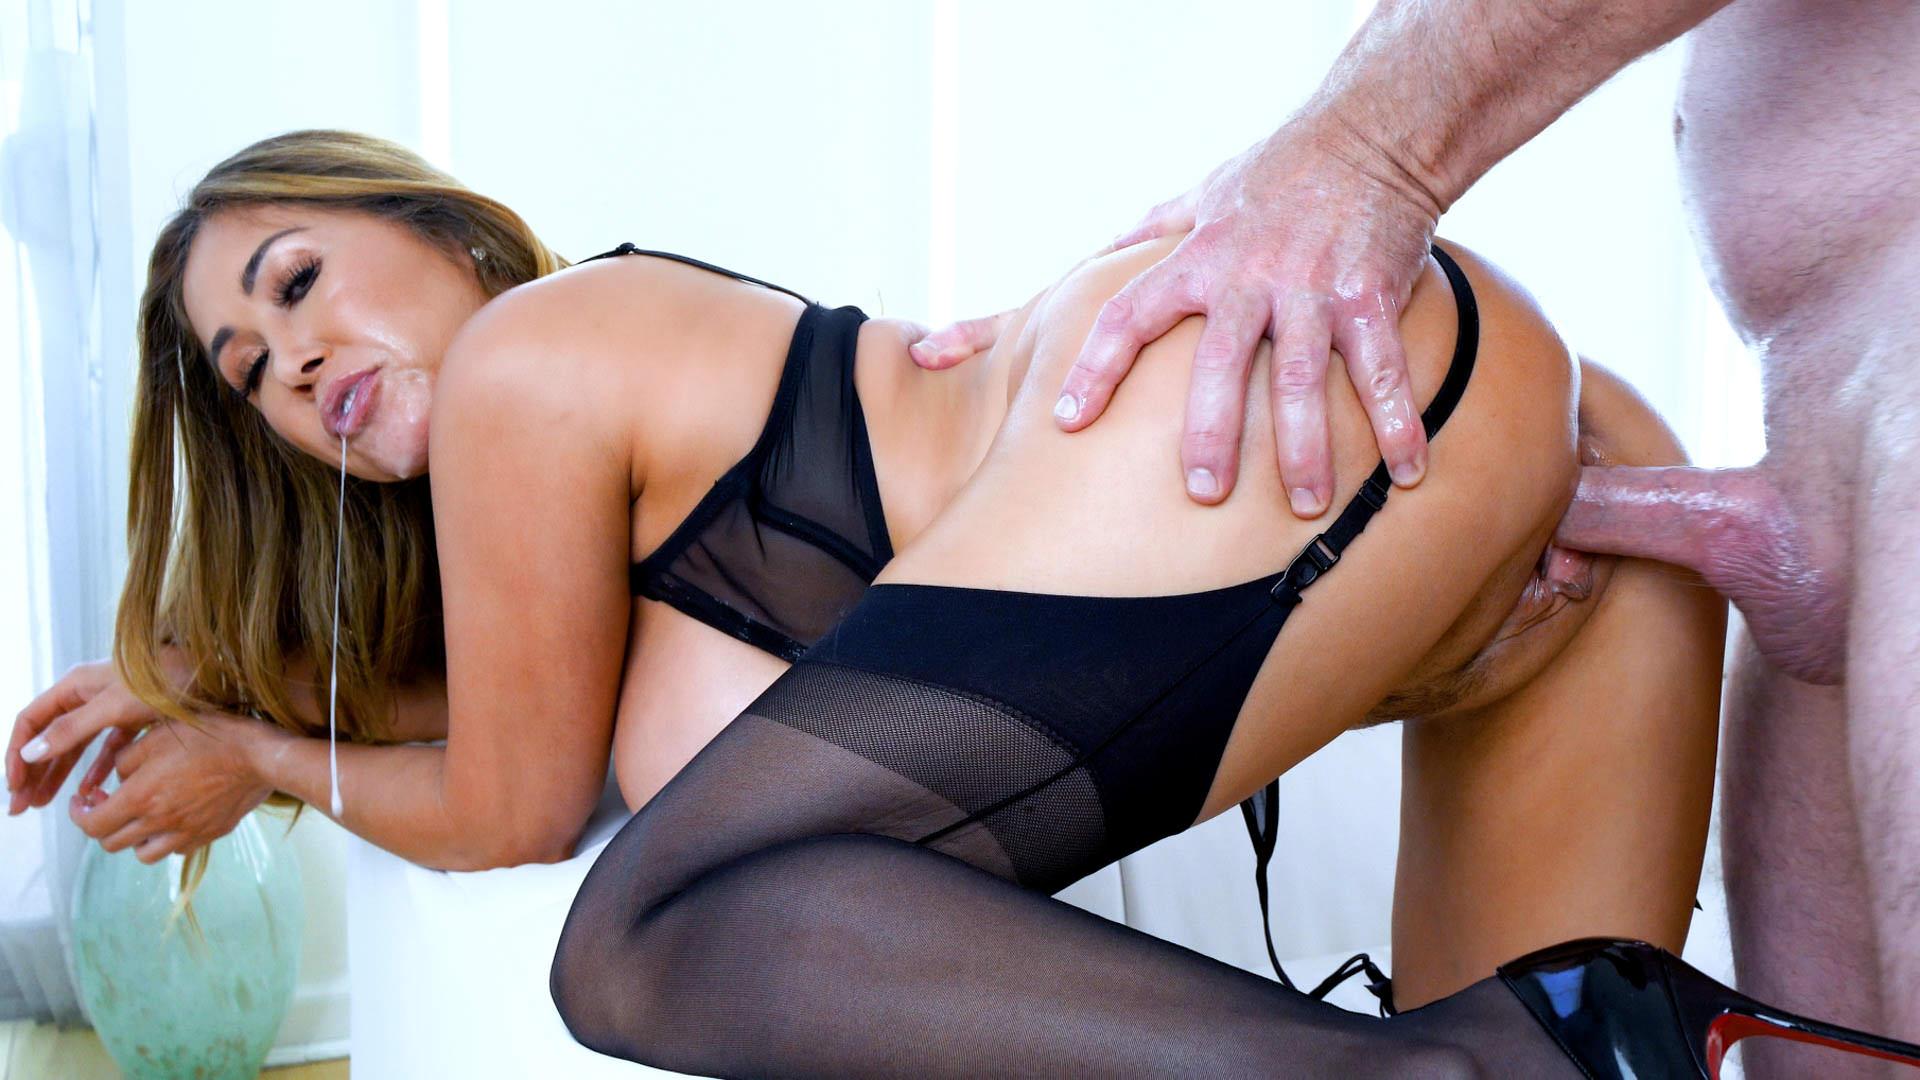 Kianna Dior: Busty Cum Slut 8 Sc. 8